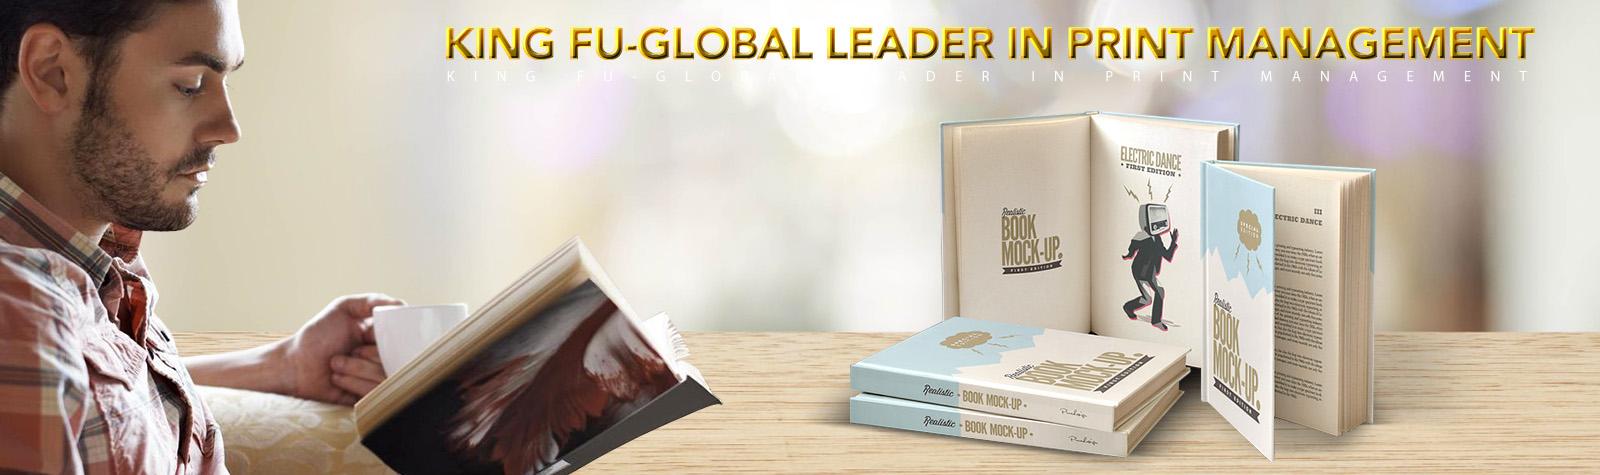 KING FU-GLOBAL LEADER IN PRINT MANAGEMENT